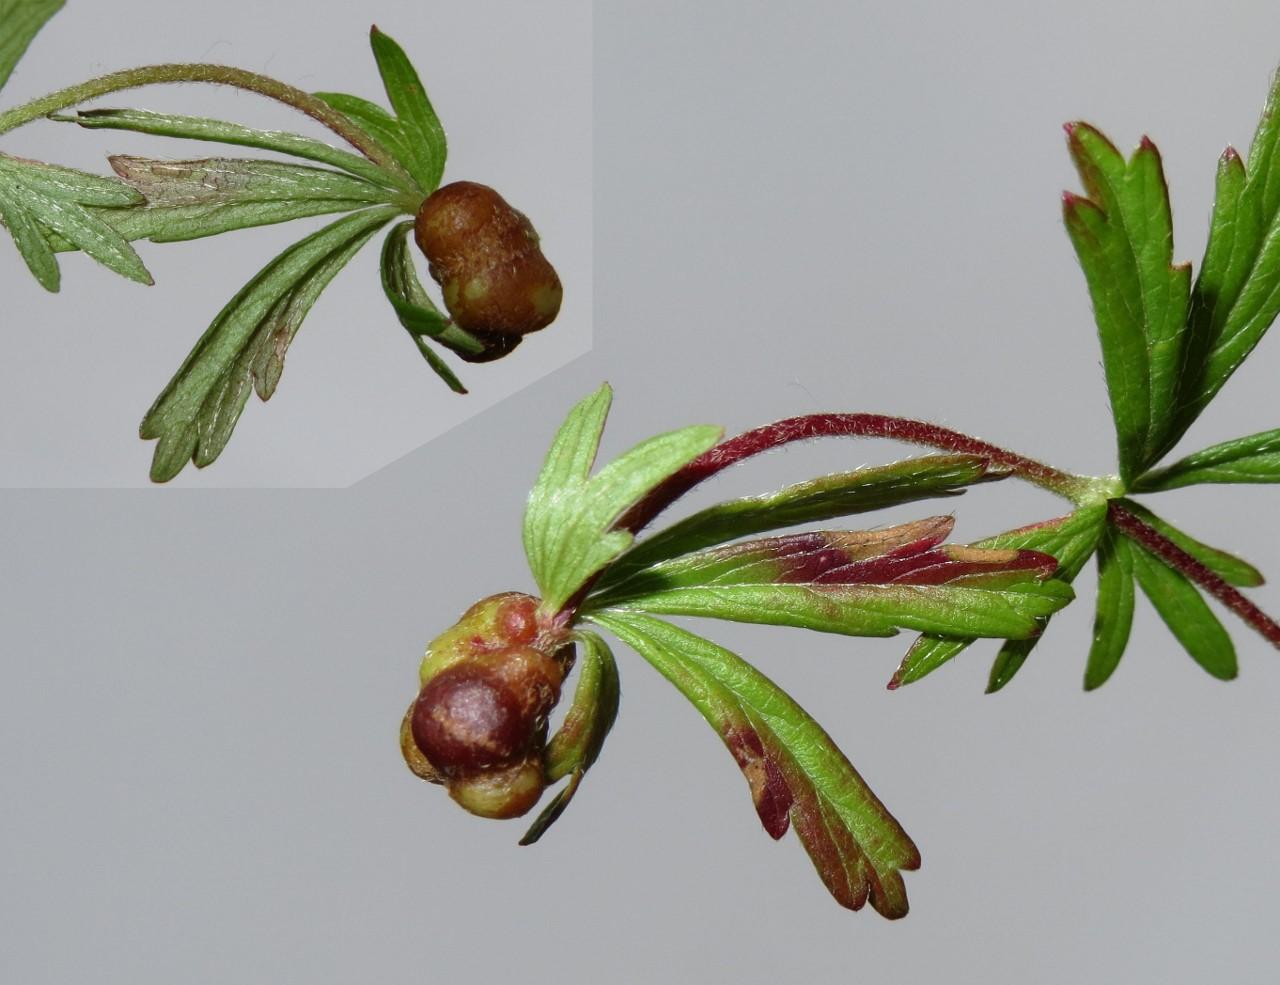 Xestophanes brevitarsis